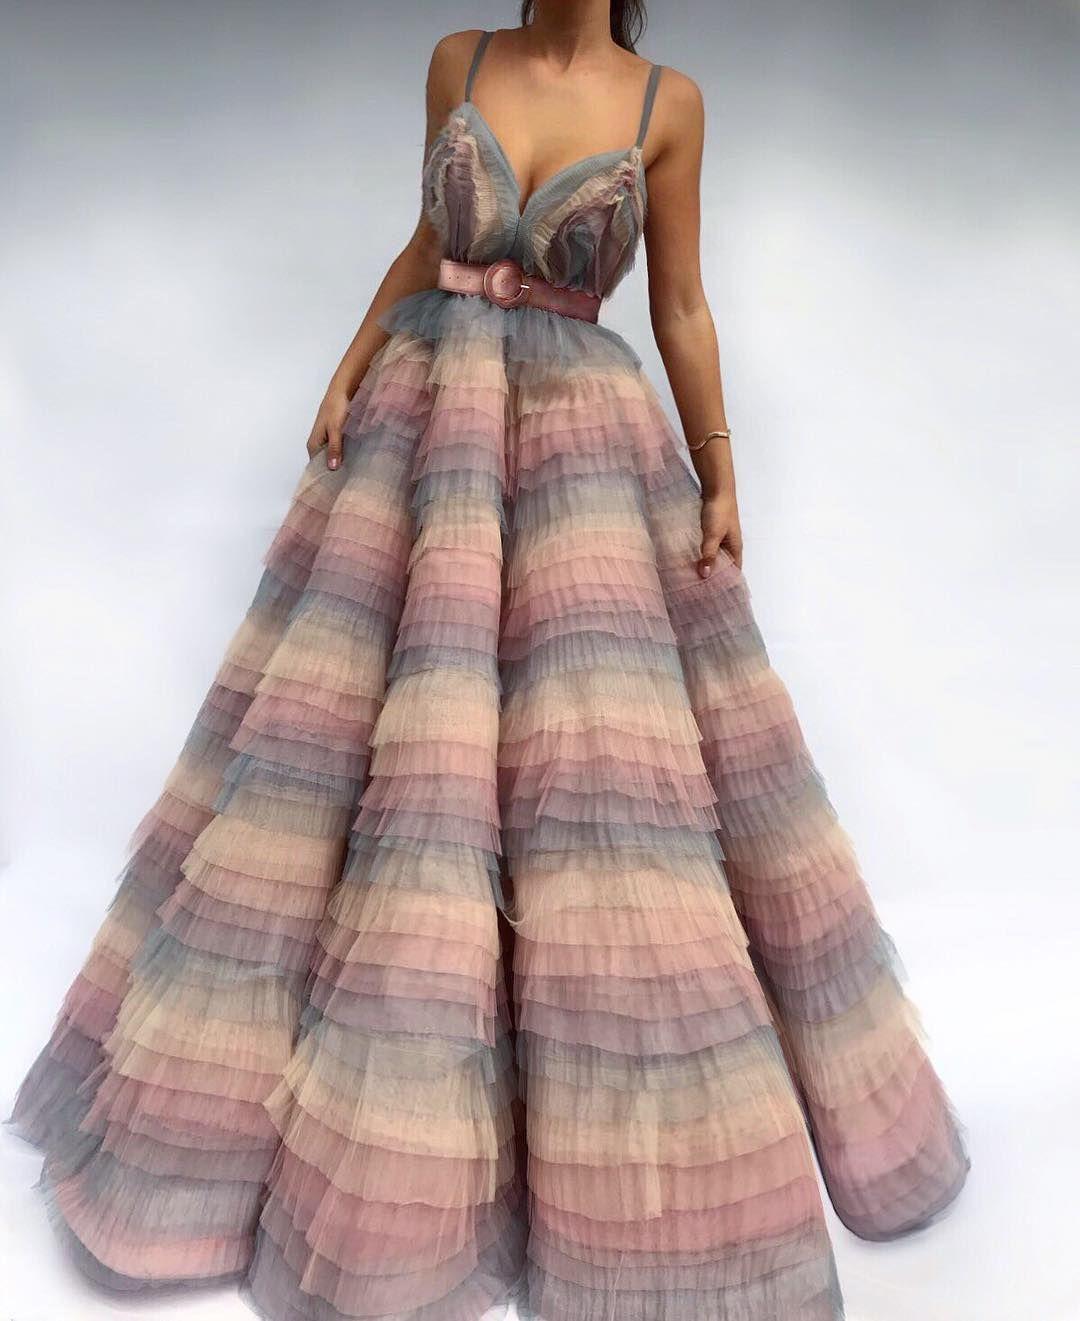 Prom Dress By Teuta Matoshi Duriqi